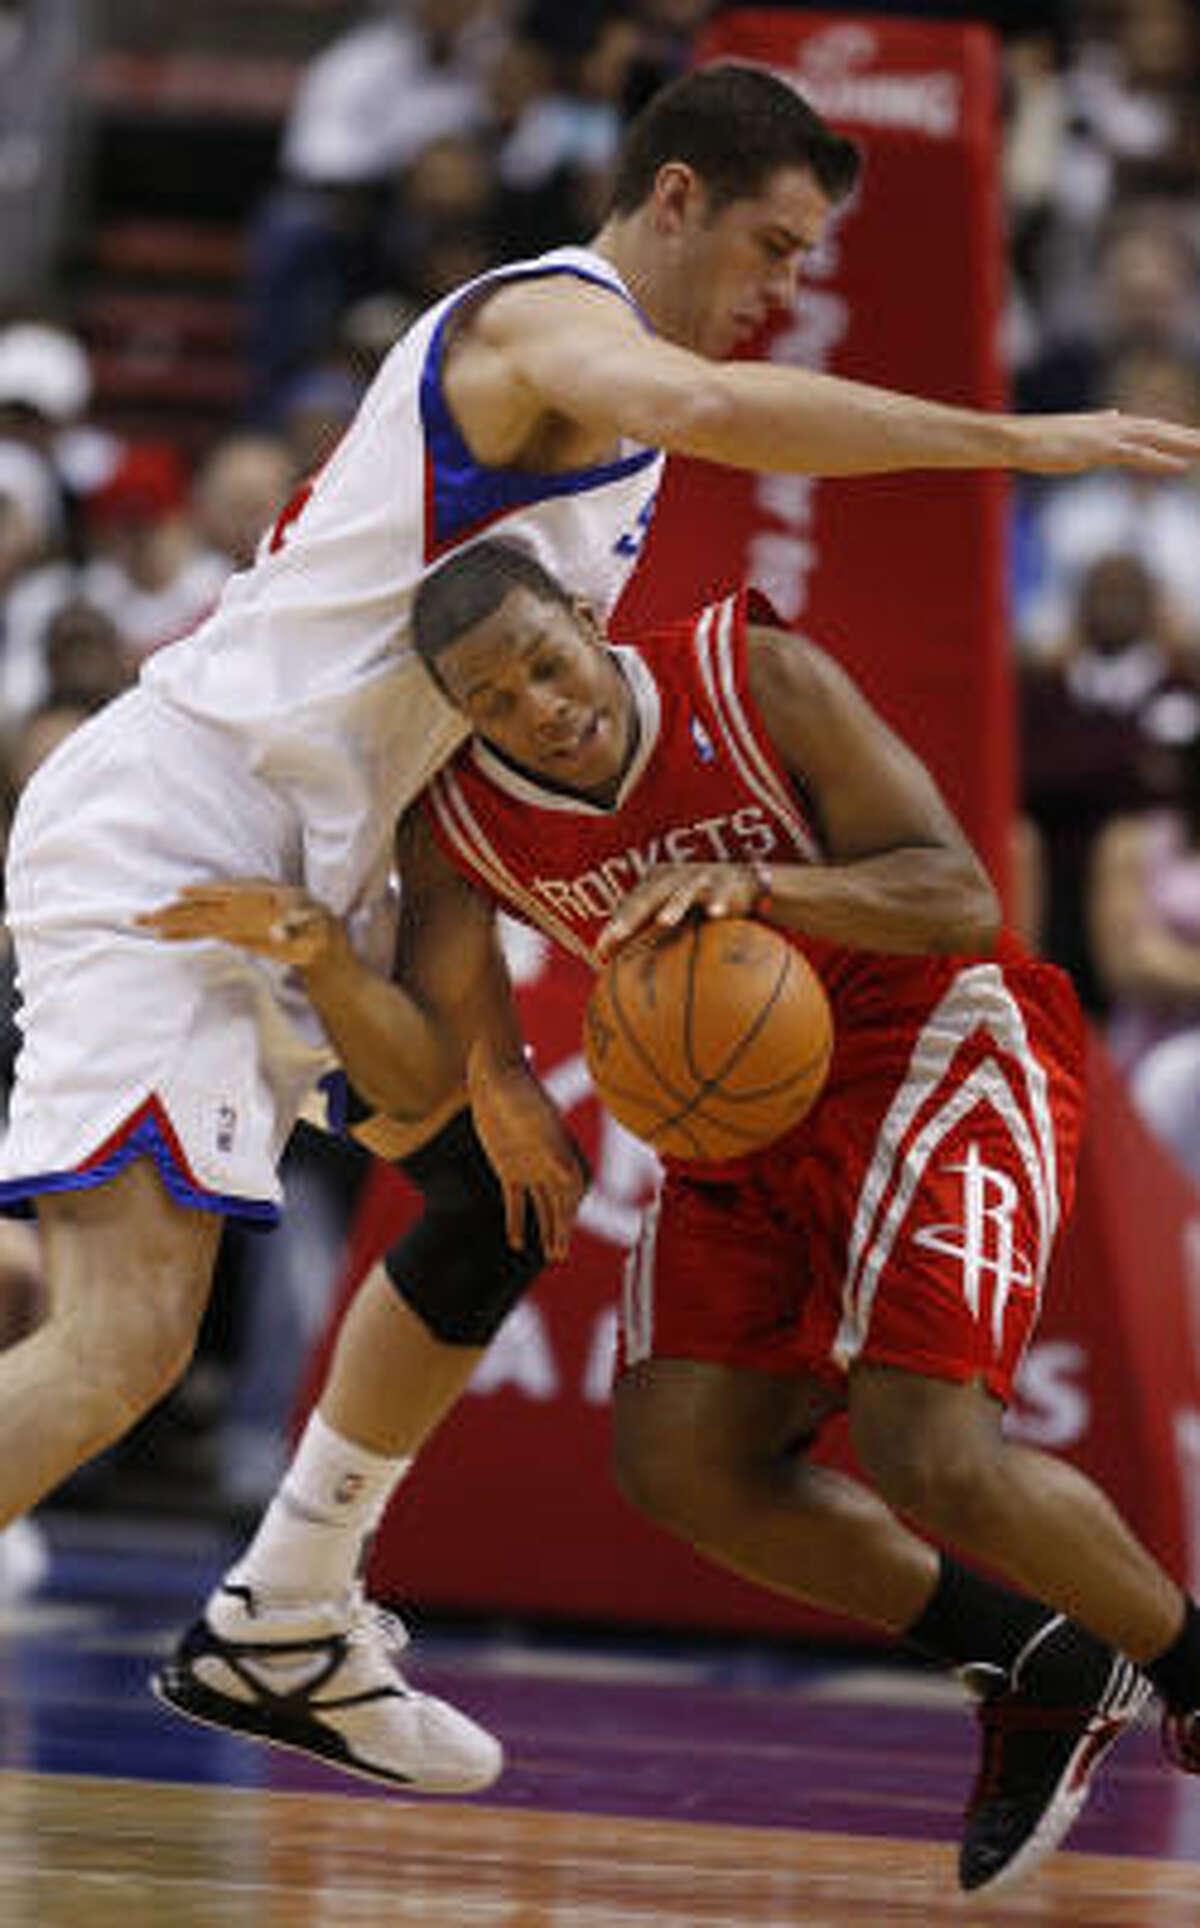 76ers center Jason Smith fouls Rockets guard Kyle Lowry.